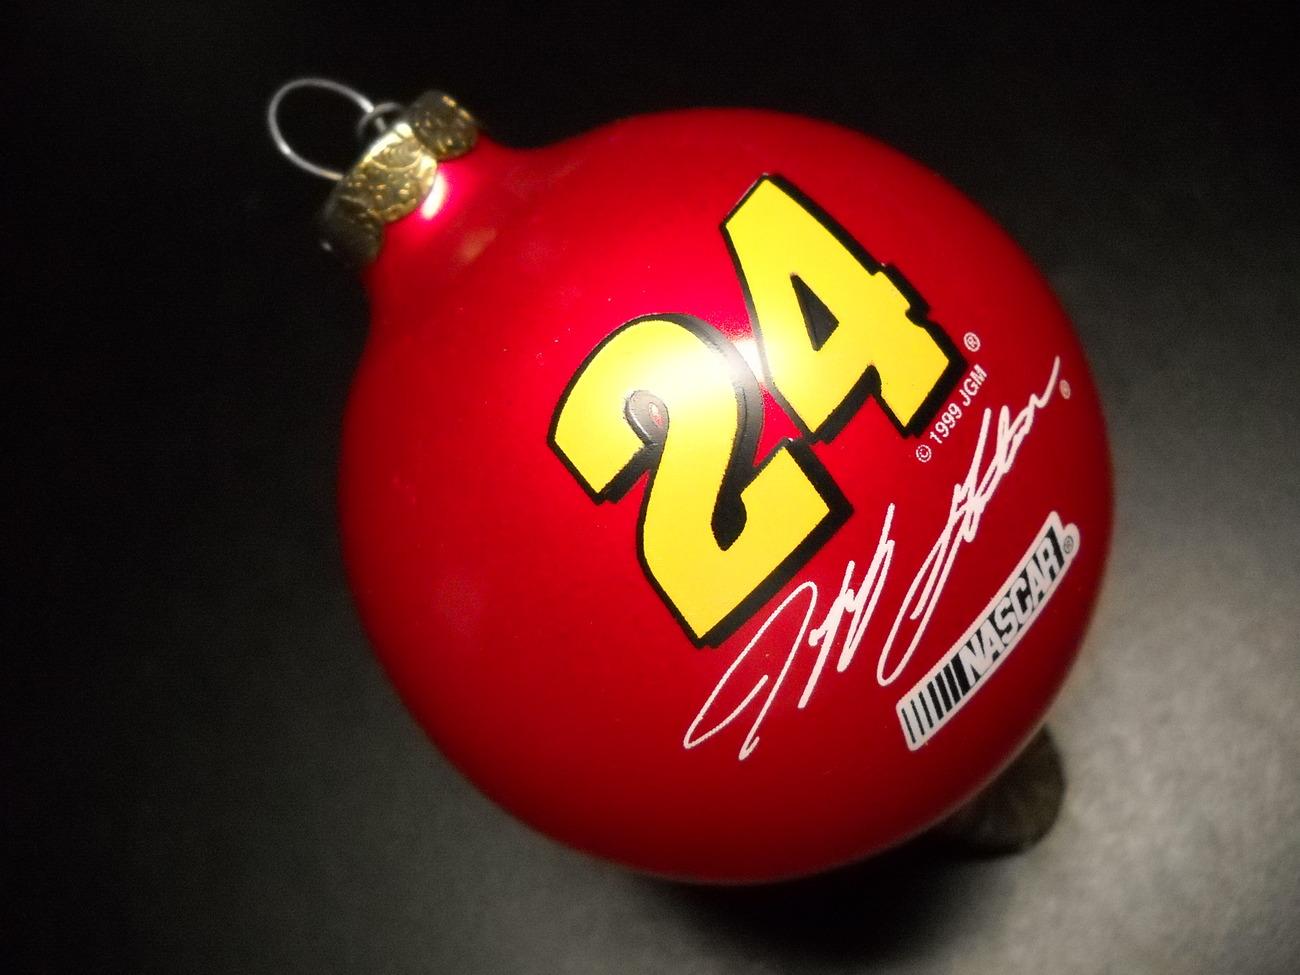 Topperscot NASCAR Collectibles Ornament 1999 Jeff Gordon Nascar Number 24 Boxed - $8.99